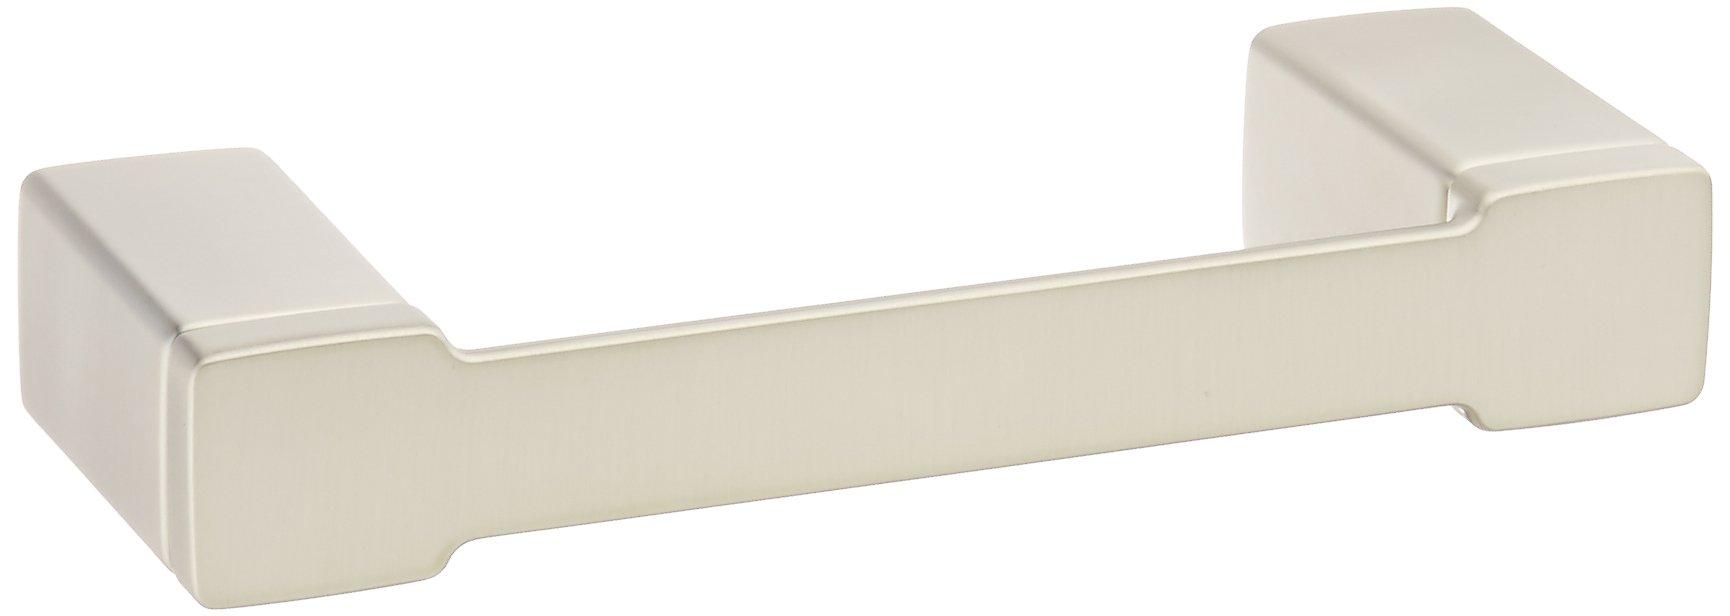 Moen YB8808BN 90 Degree Pivoting Toilet Paper Holder, Brushed Nickel by Moen